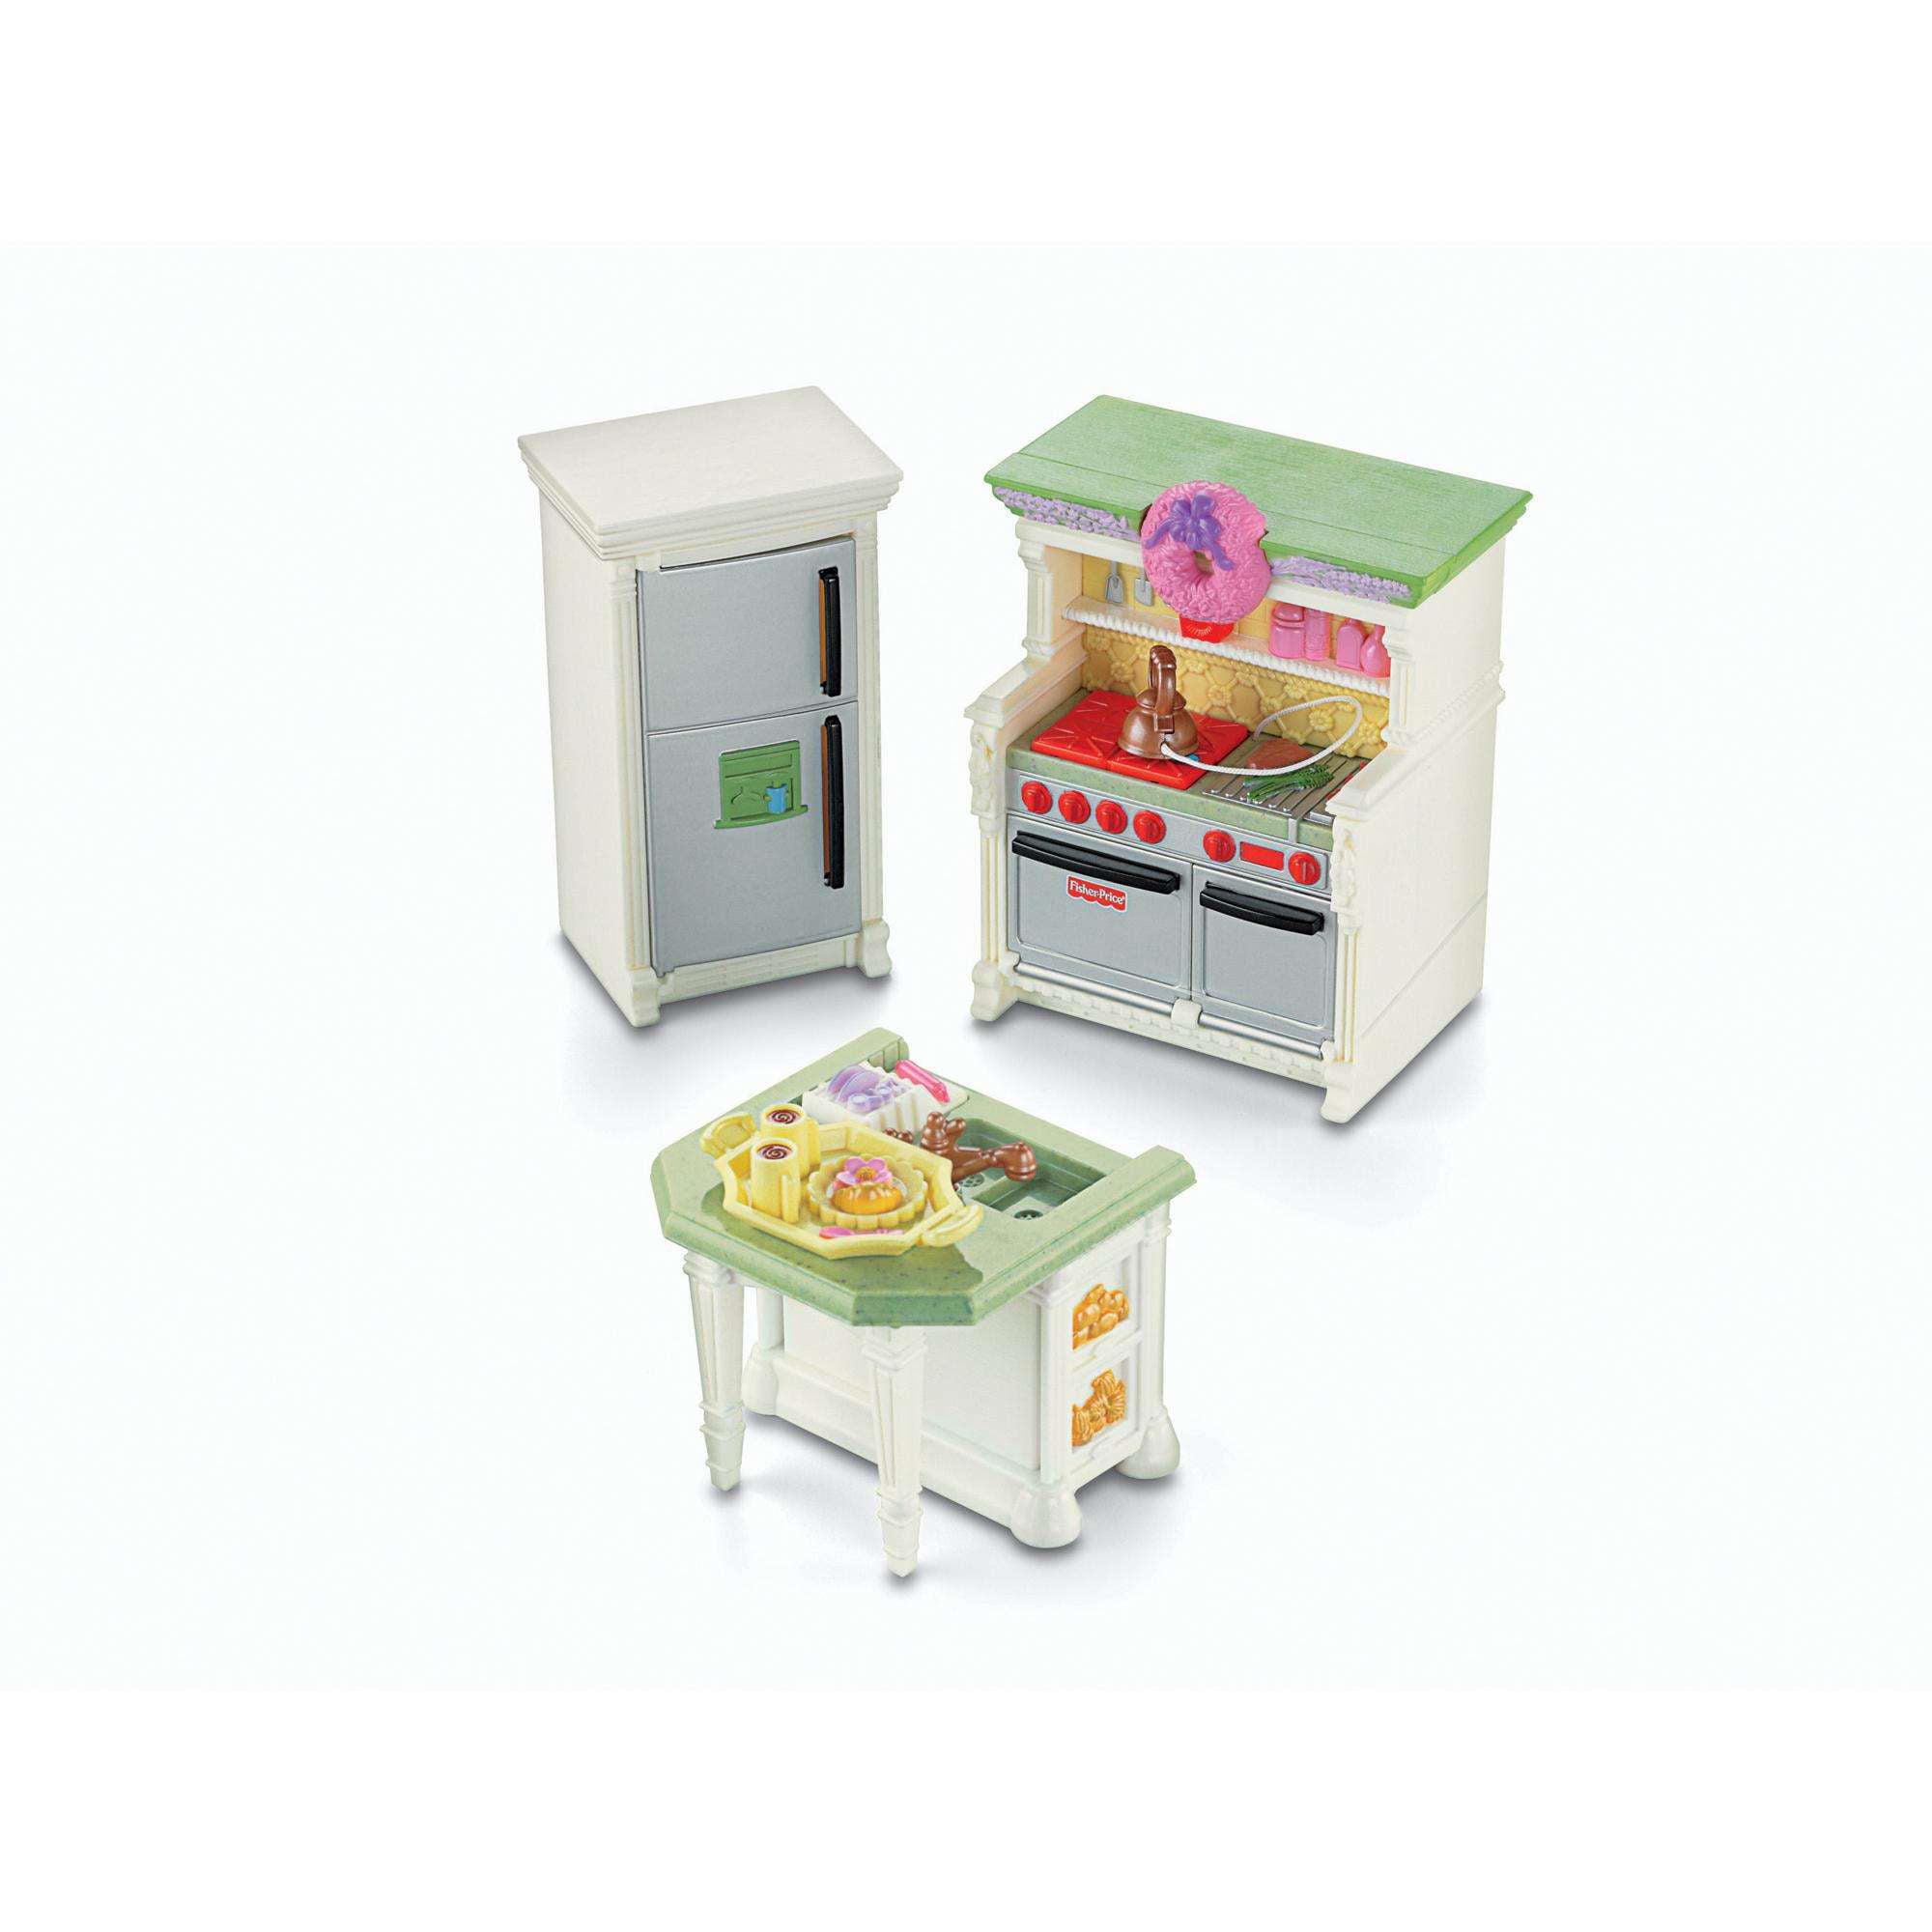 Fisher-Price Loving Family Dollhouse Furniture, Kitchen - Walmart.com